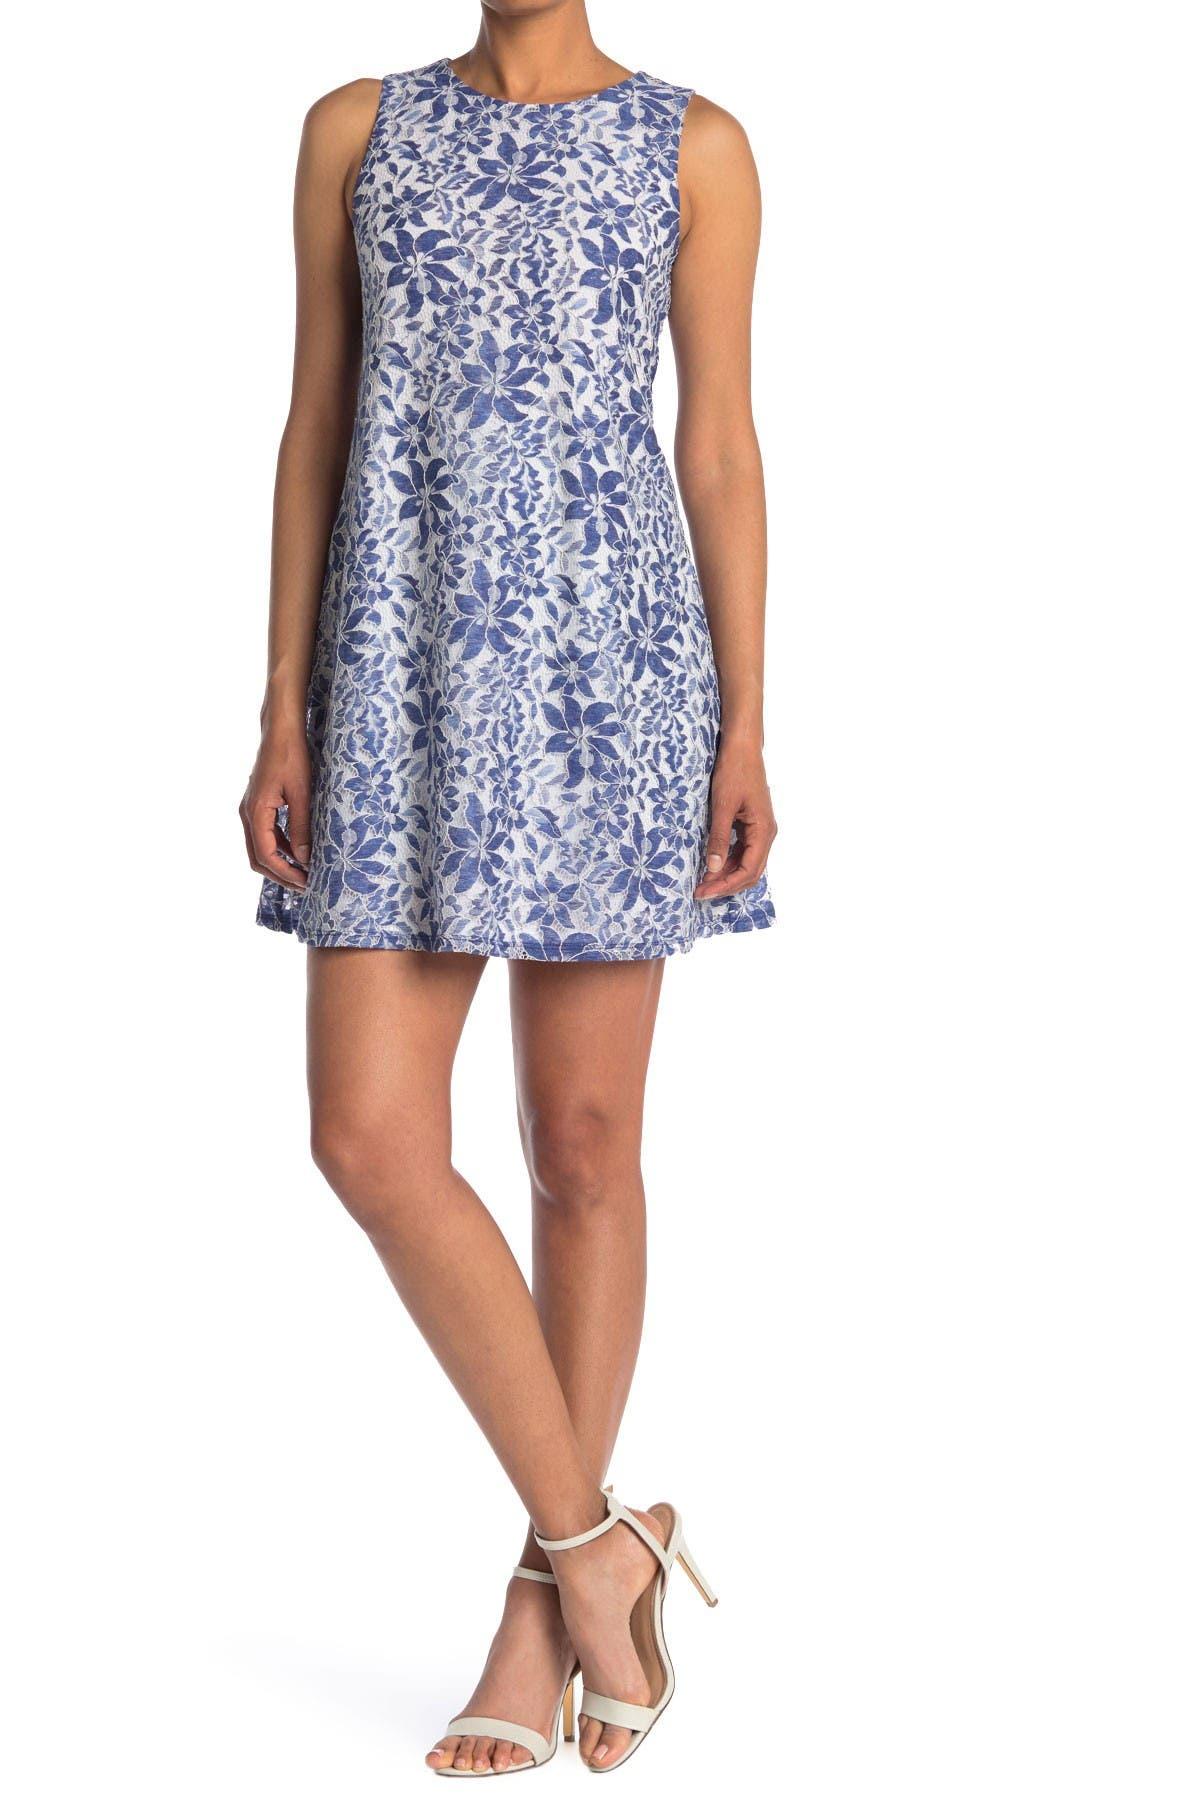 Image of Eliza J Sleeveless Floral Dress